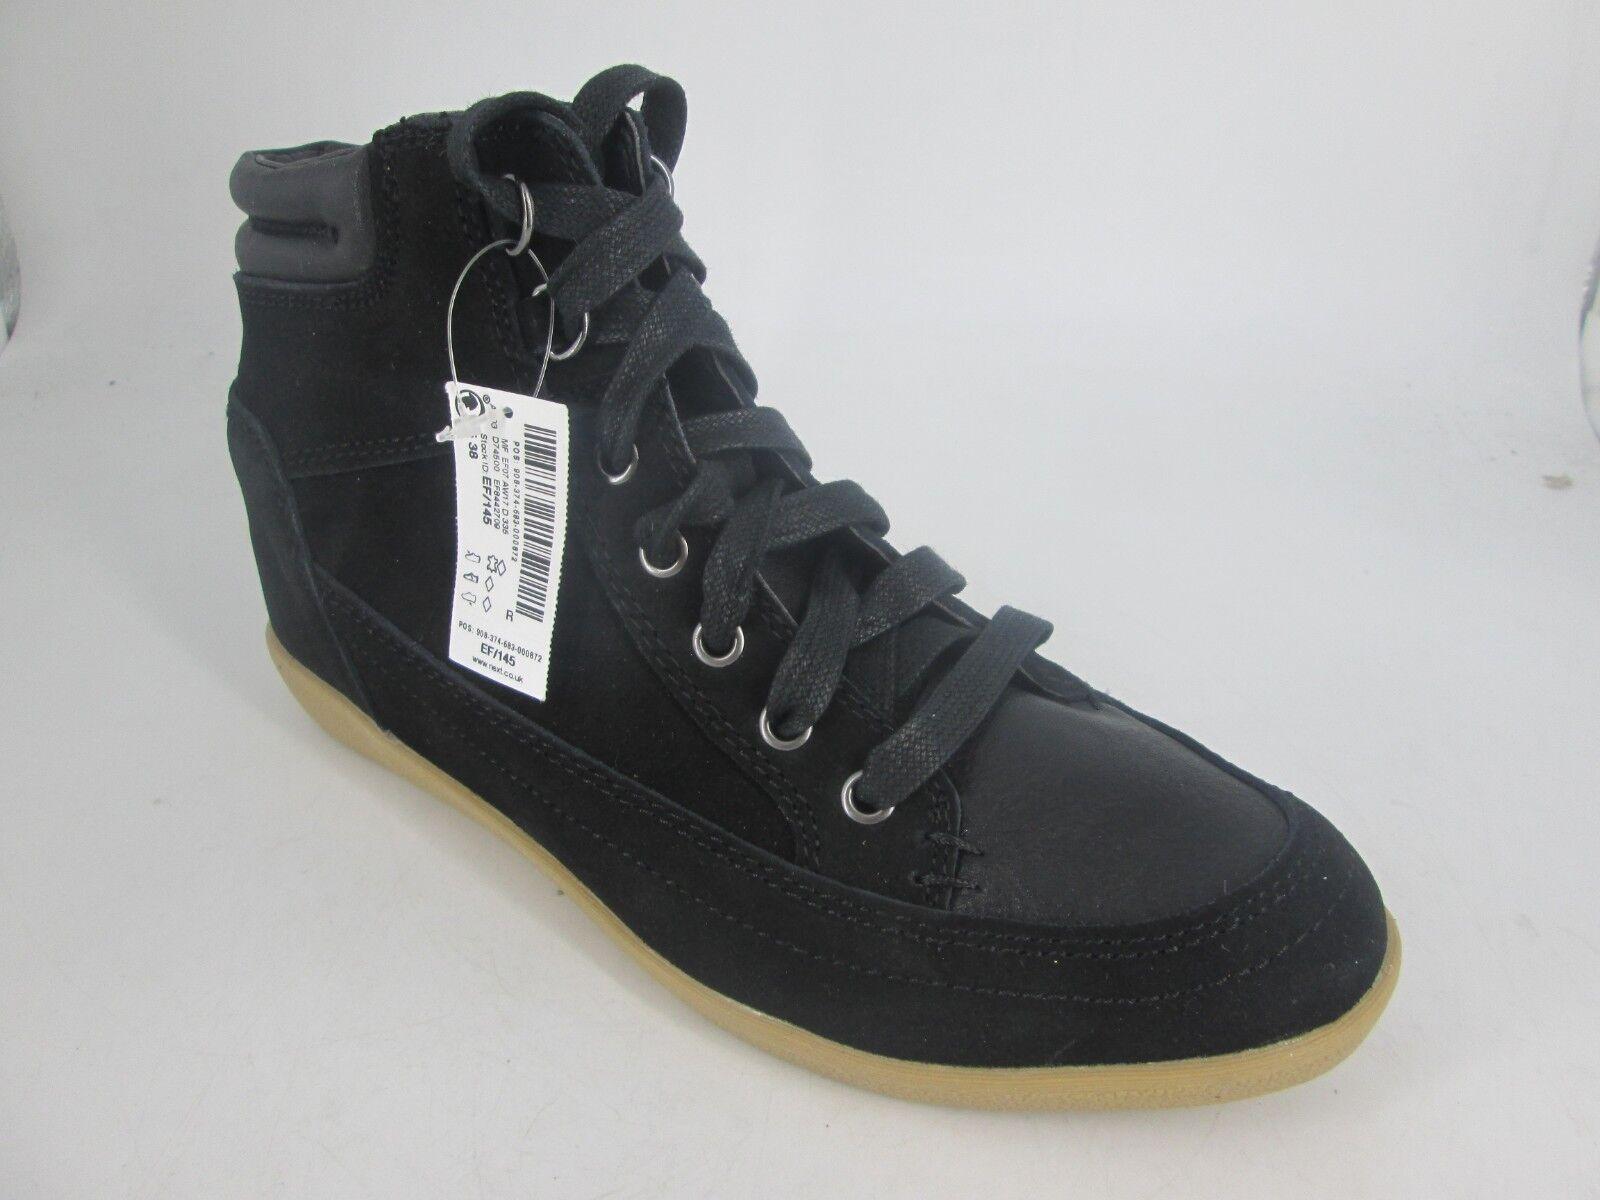 Next Ladies Leather Lace Up Ankle Boots LN089 JJ 03